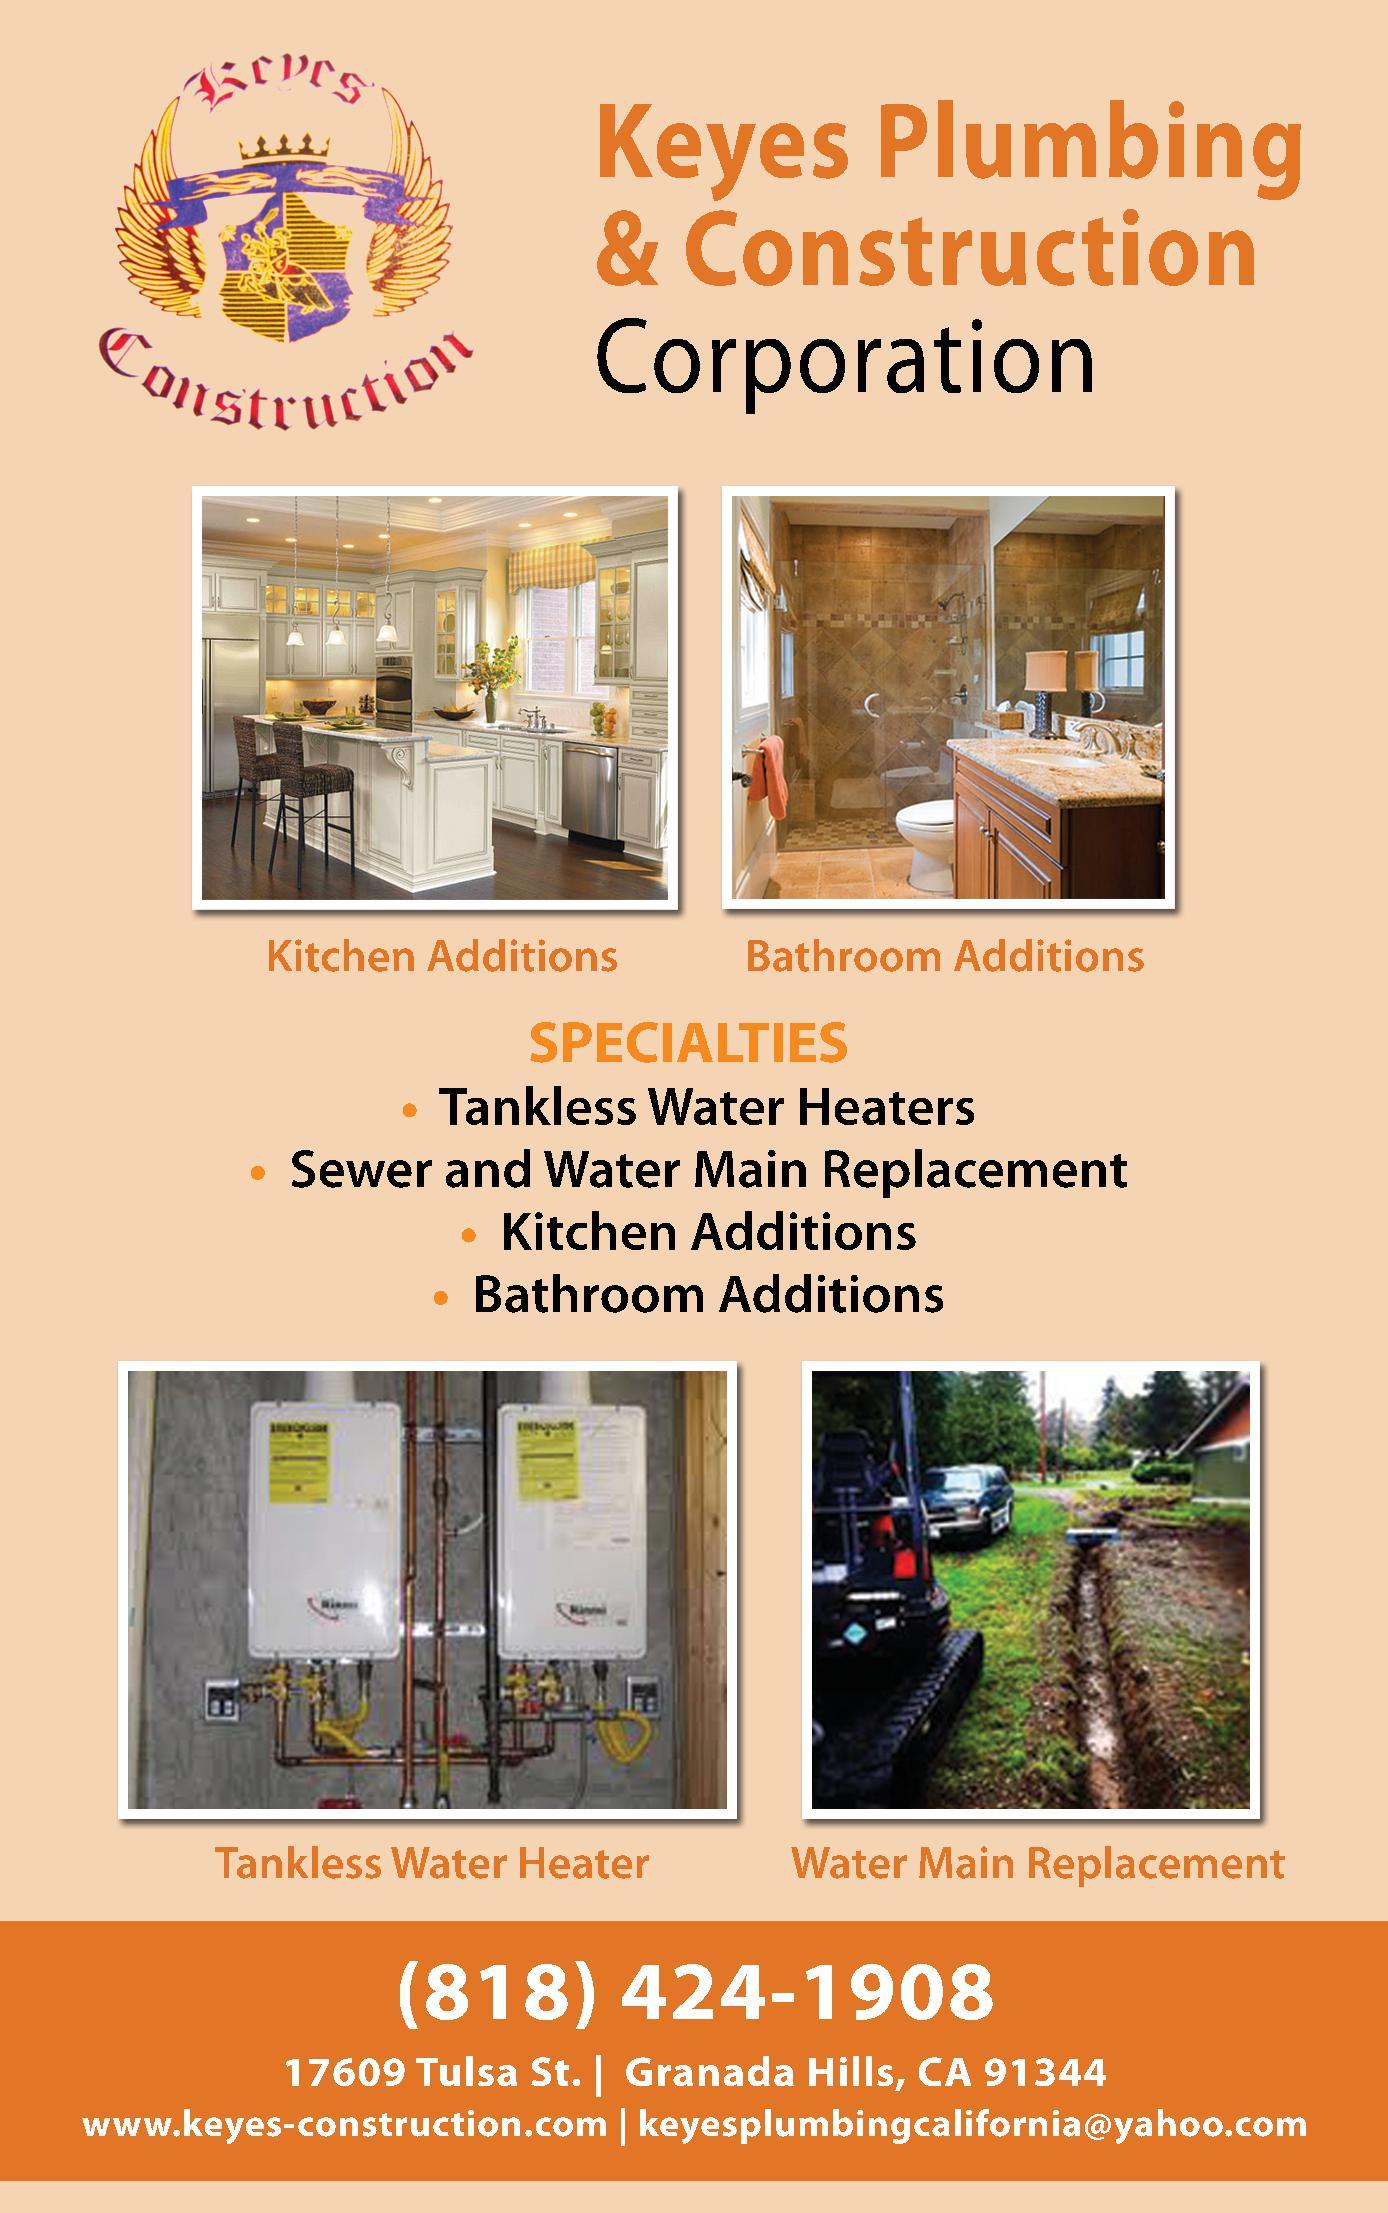 Keyes Plumbing & Construction